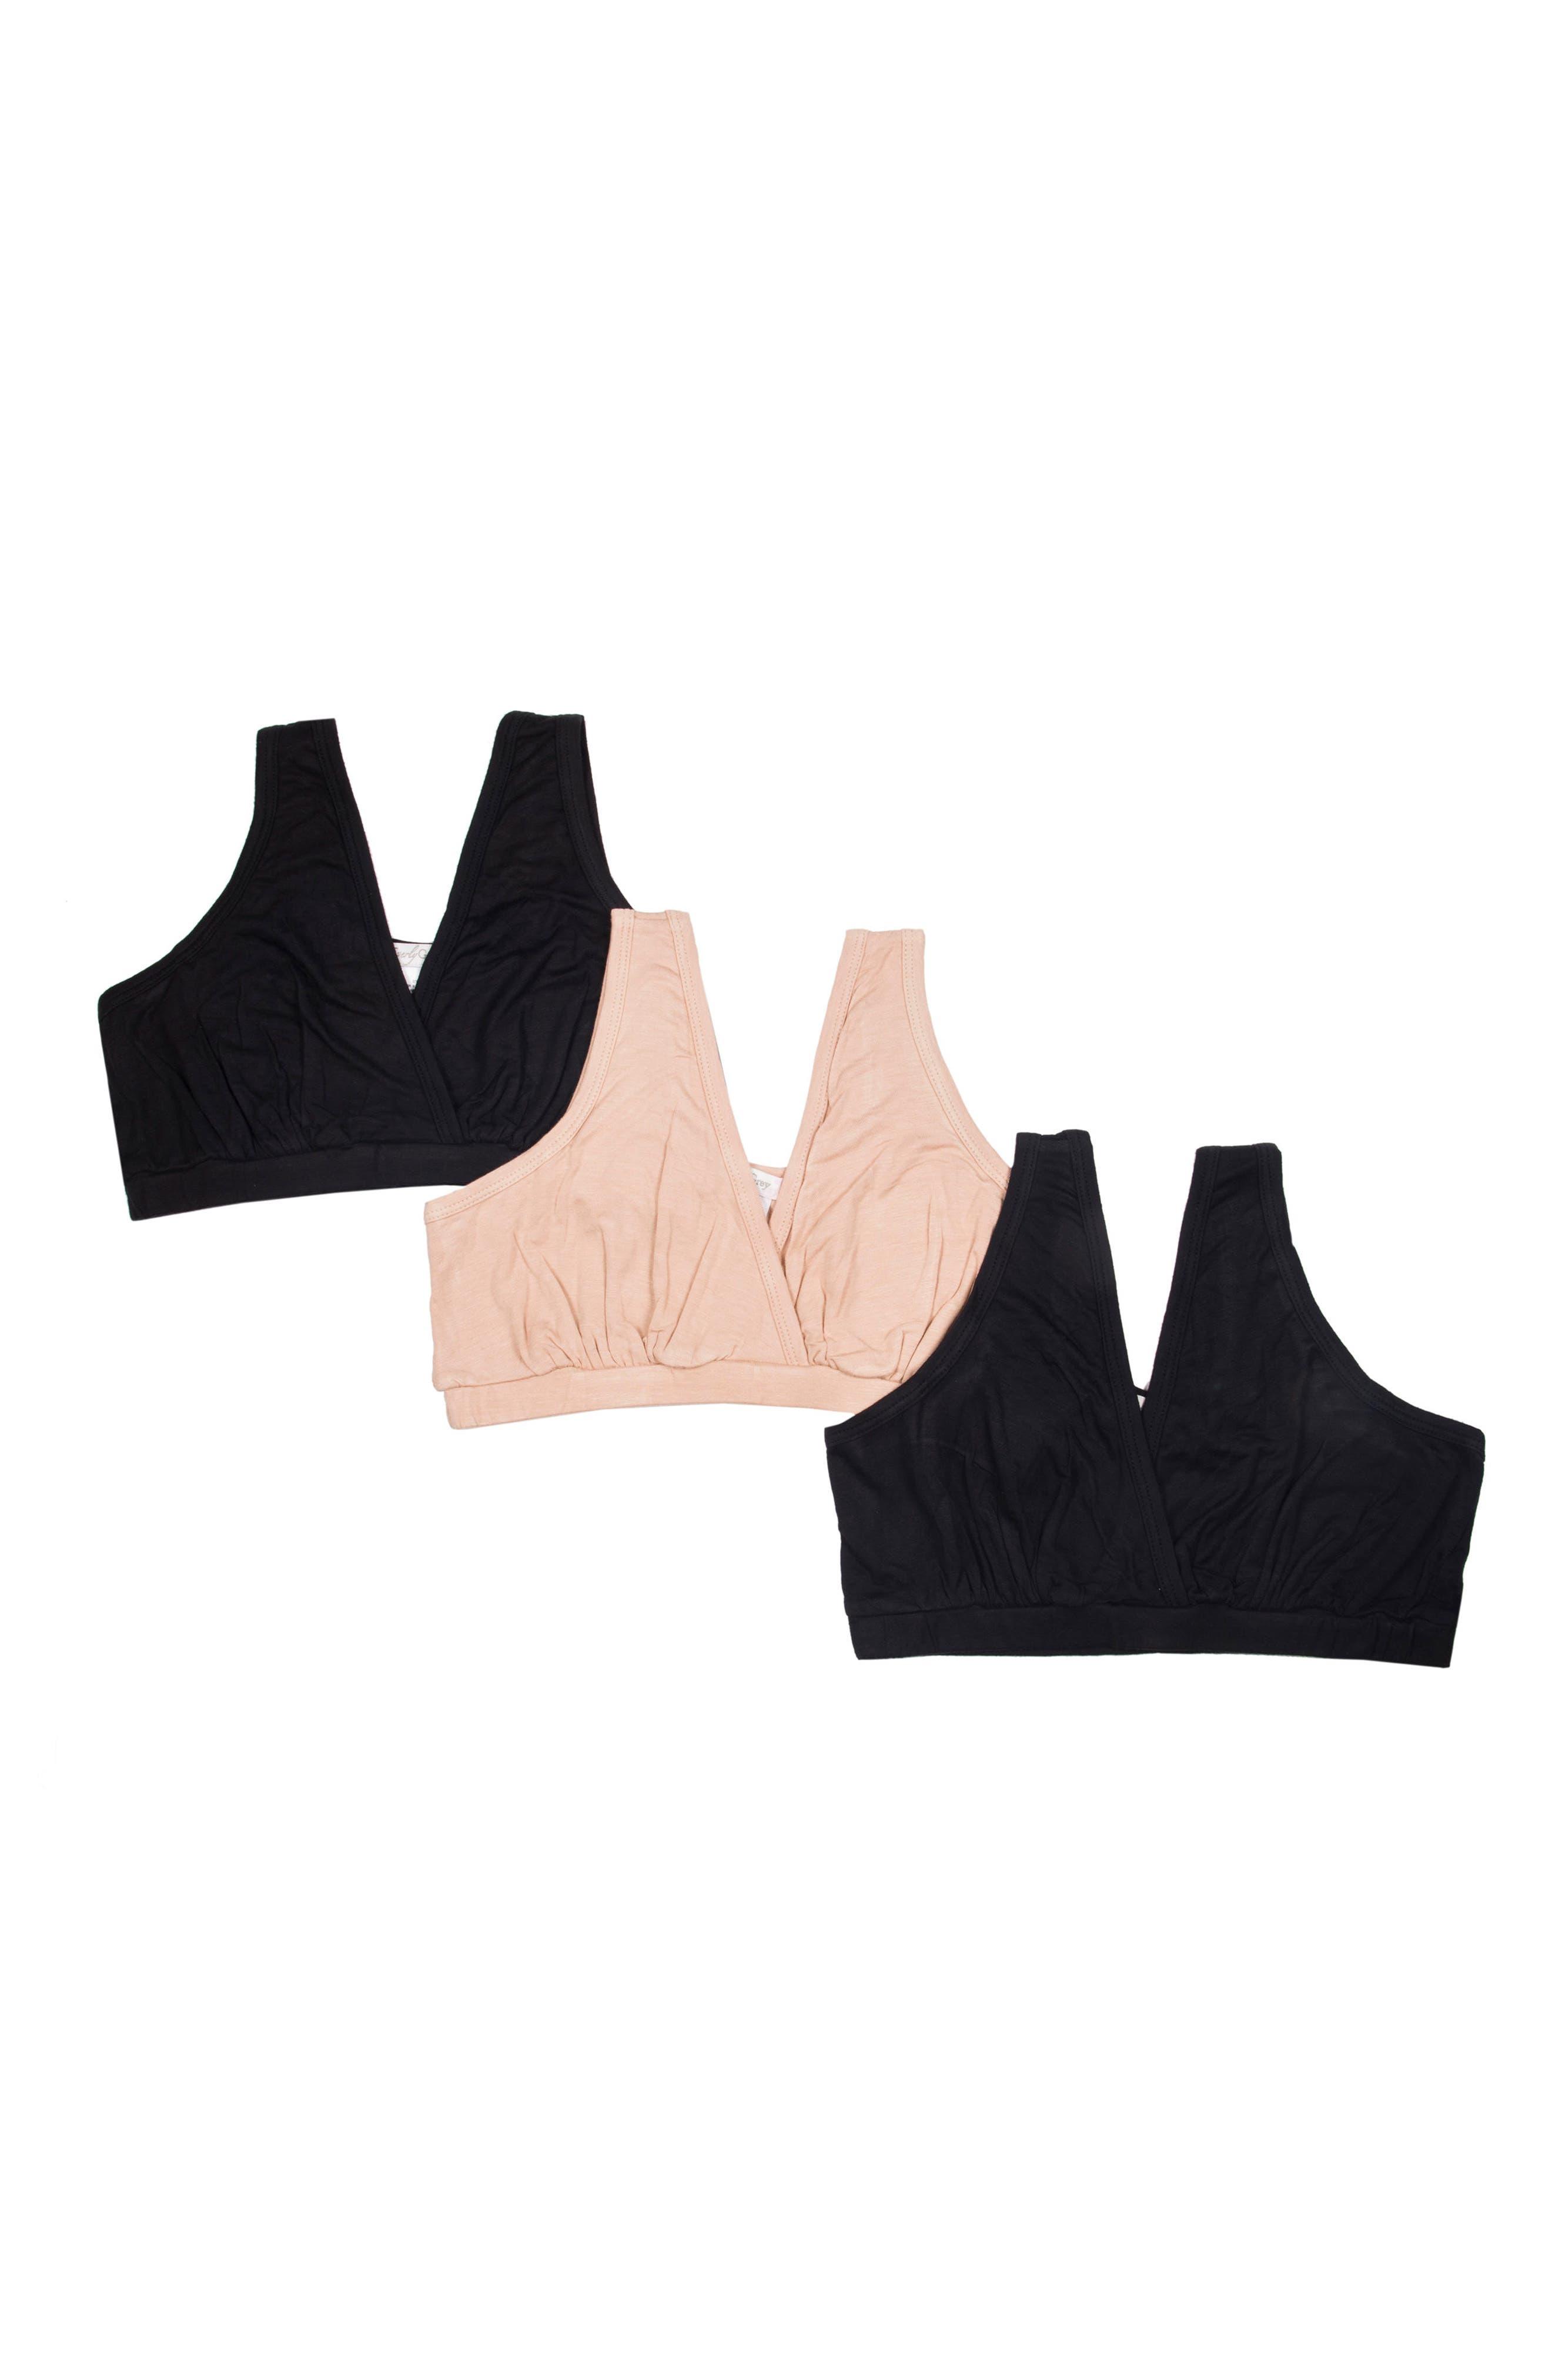 3-Pack Maternity Sleep Bras,                         Main,                         color, Black/ Nude/ Black